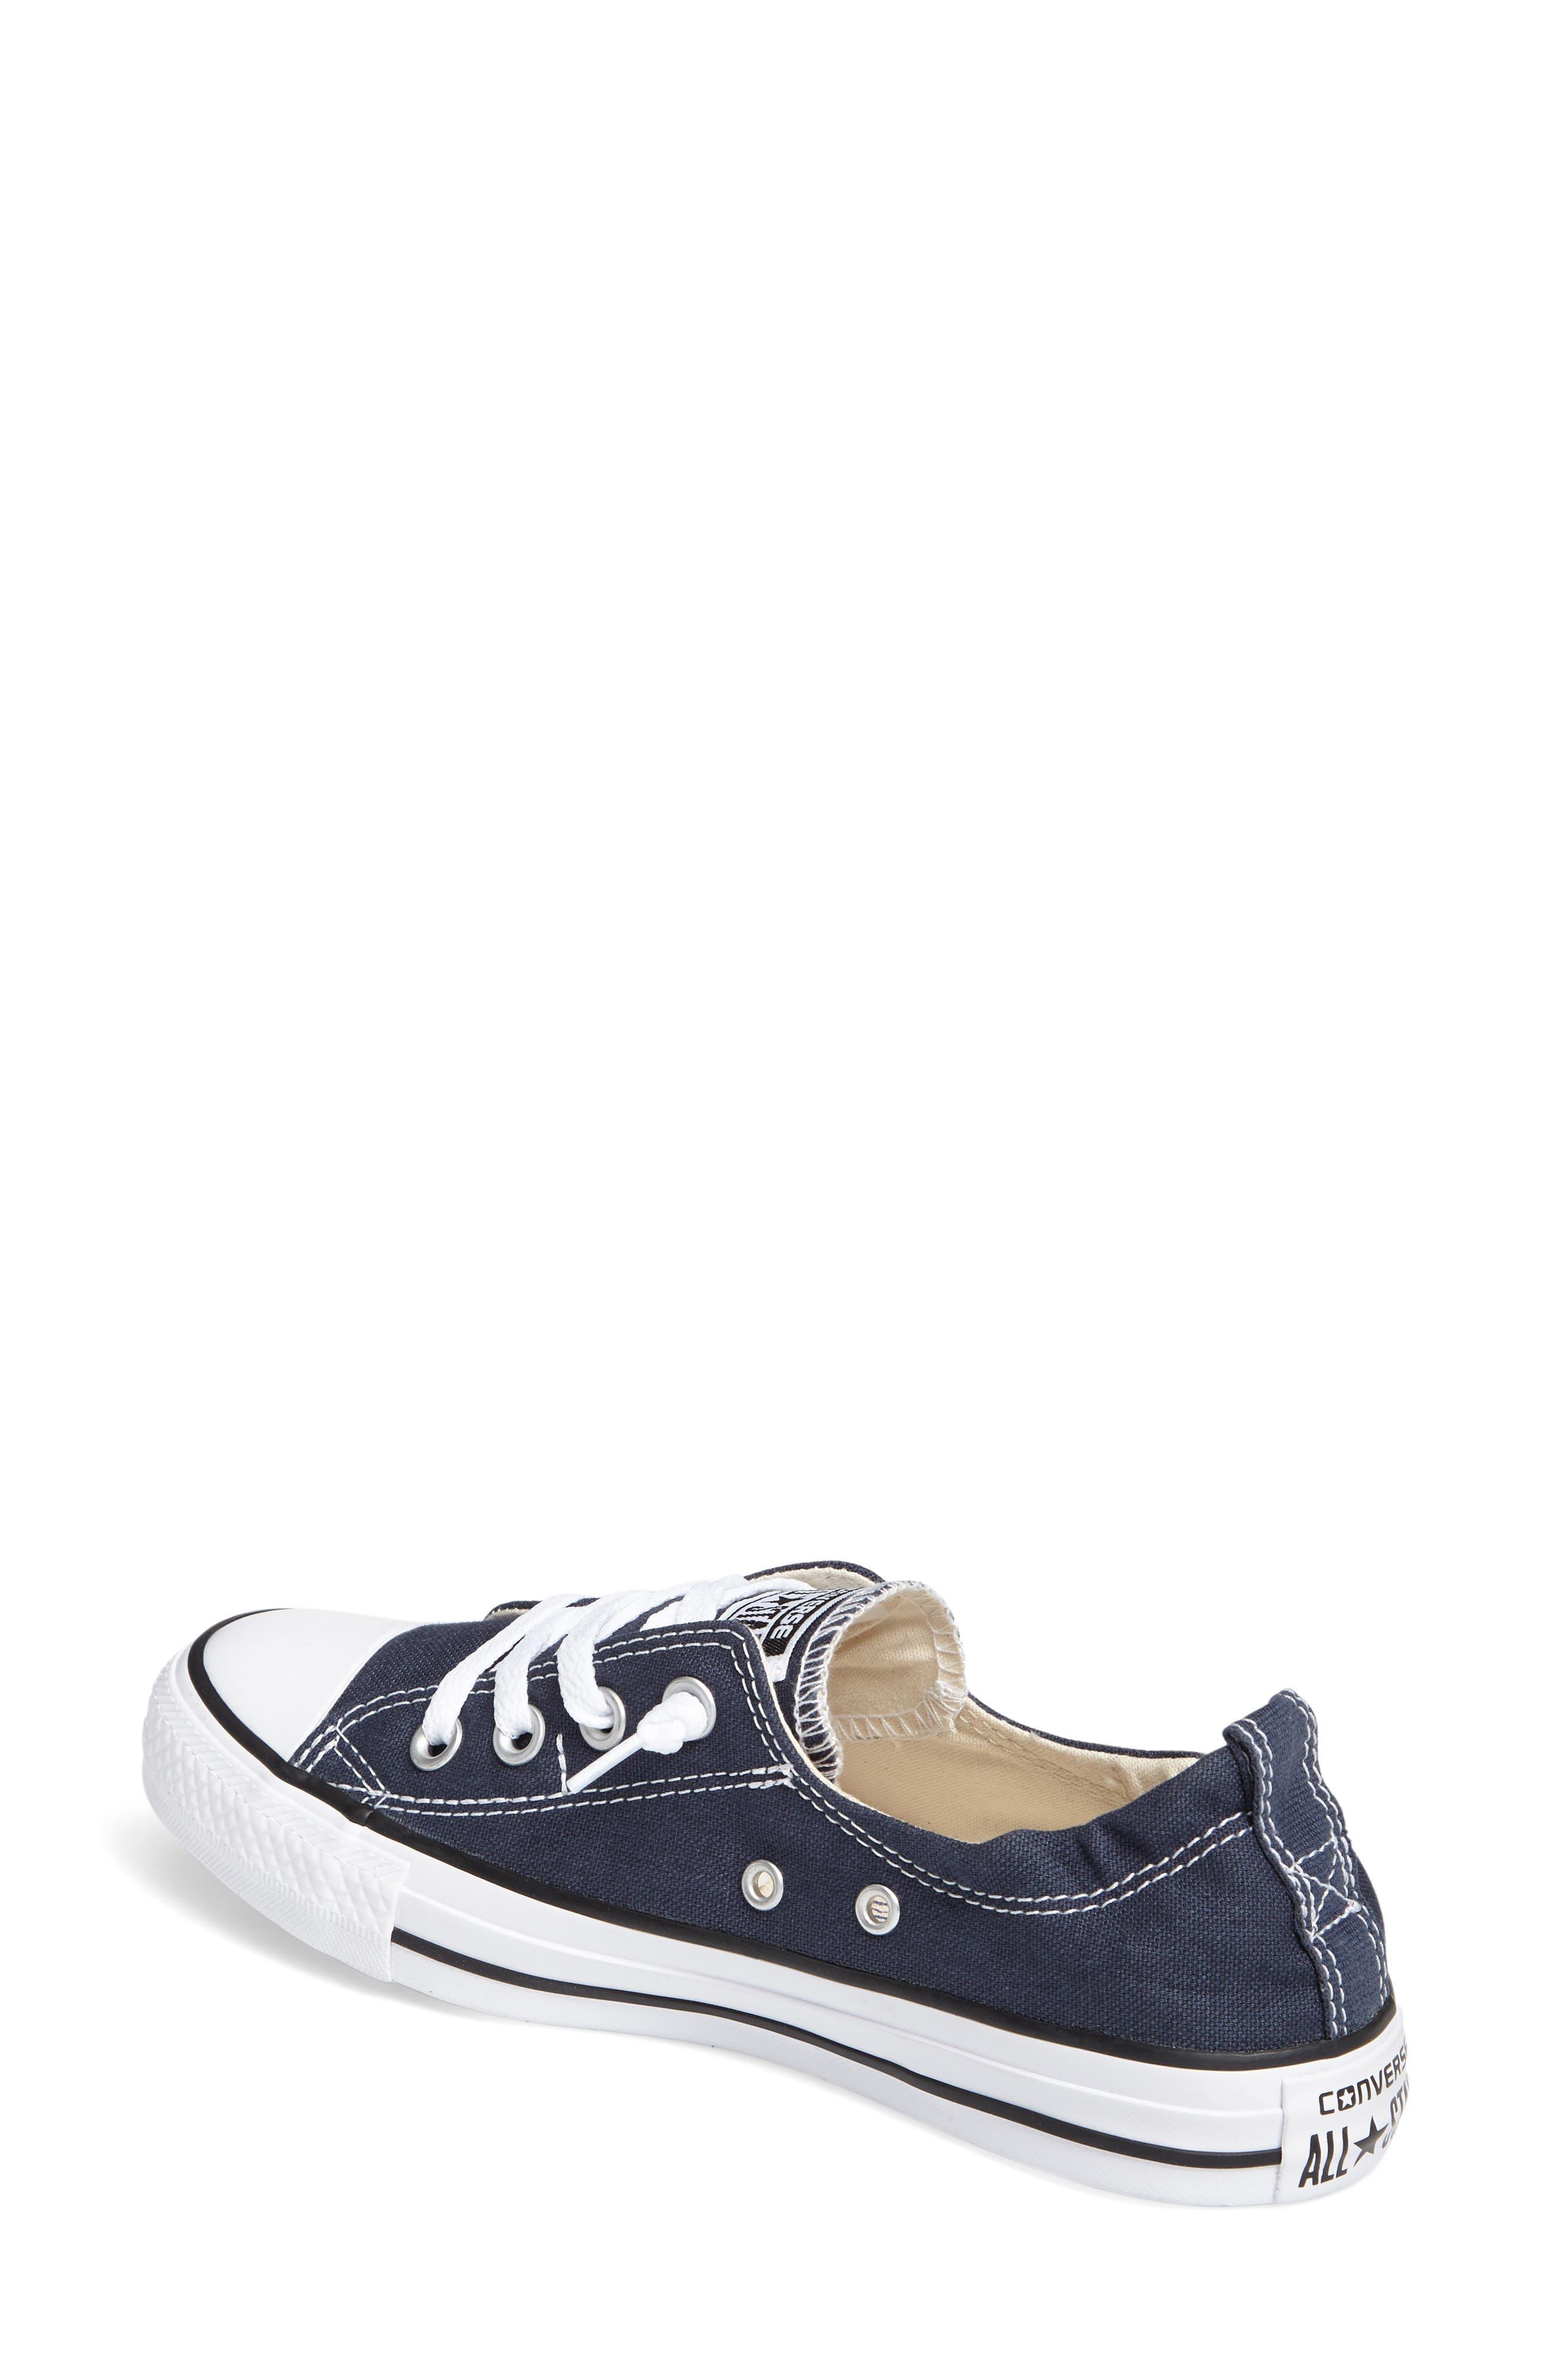 Chuck Taylor<sup>®</sup> 'Shoreline' Sneaker,                             Alternate thumbnail 3, color,                             NAVY